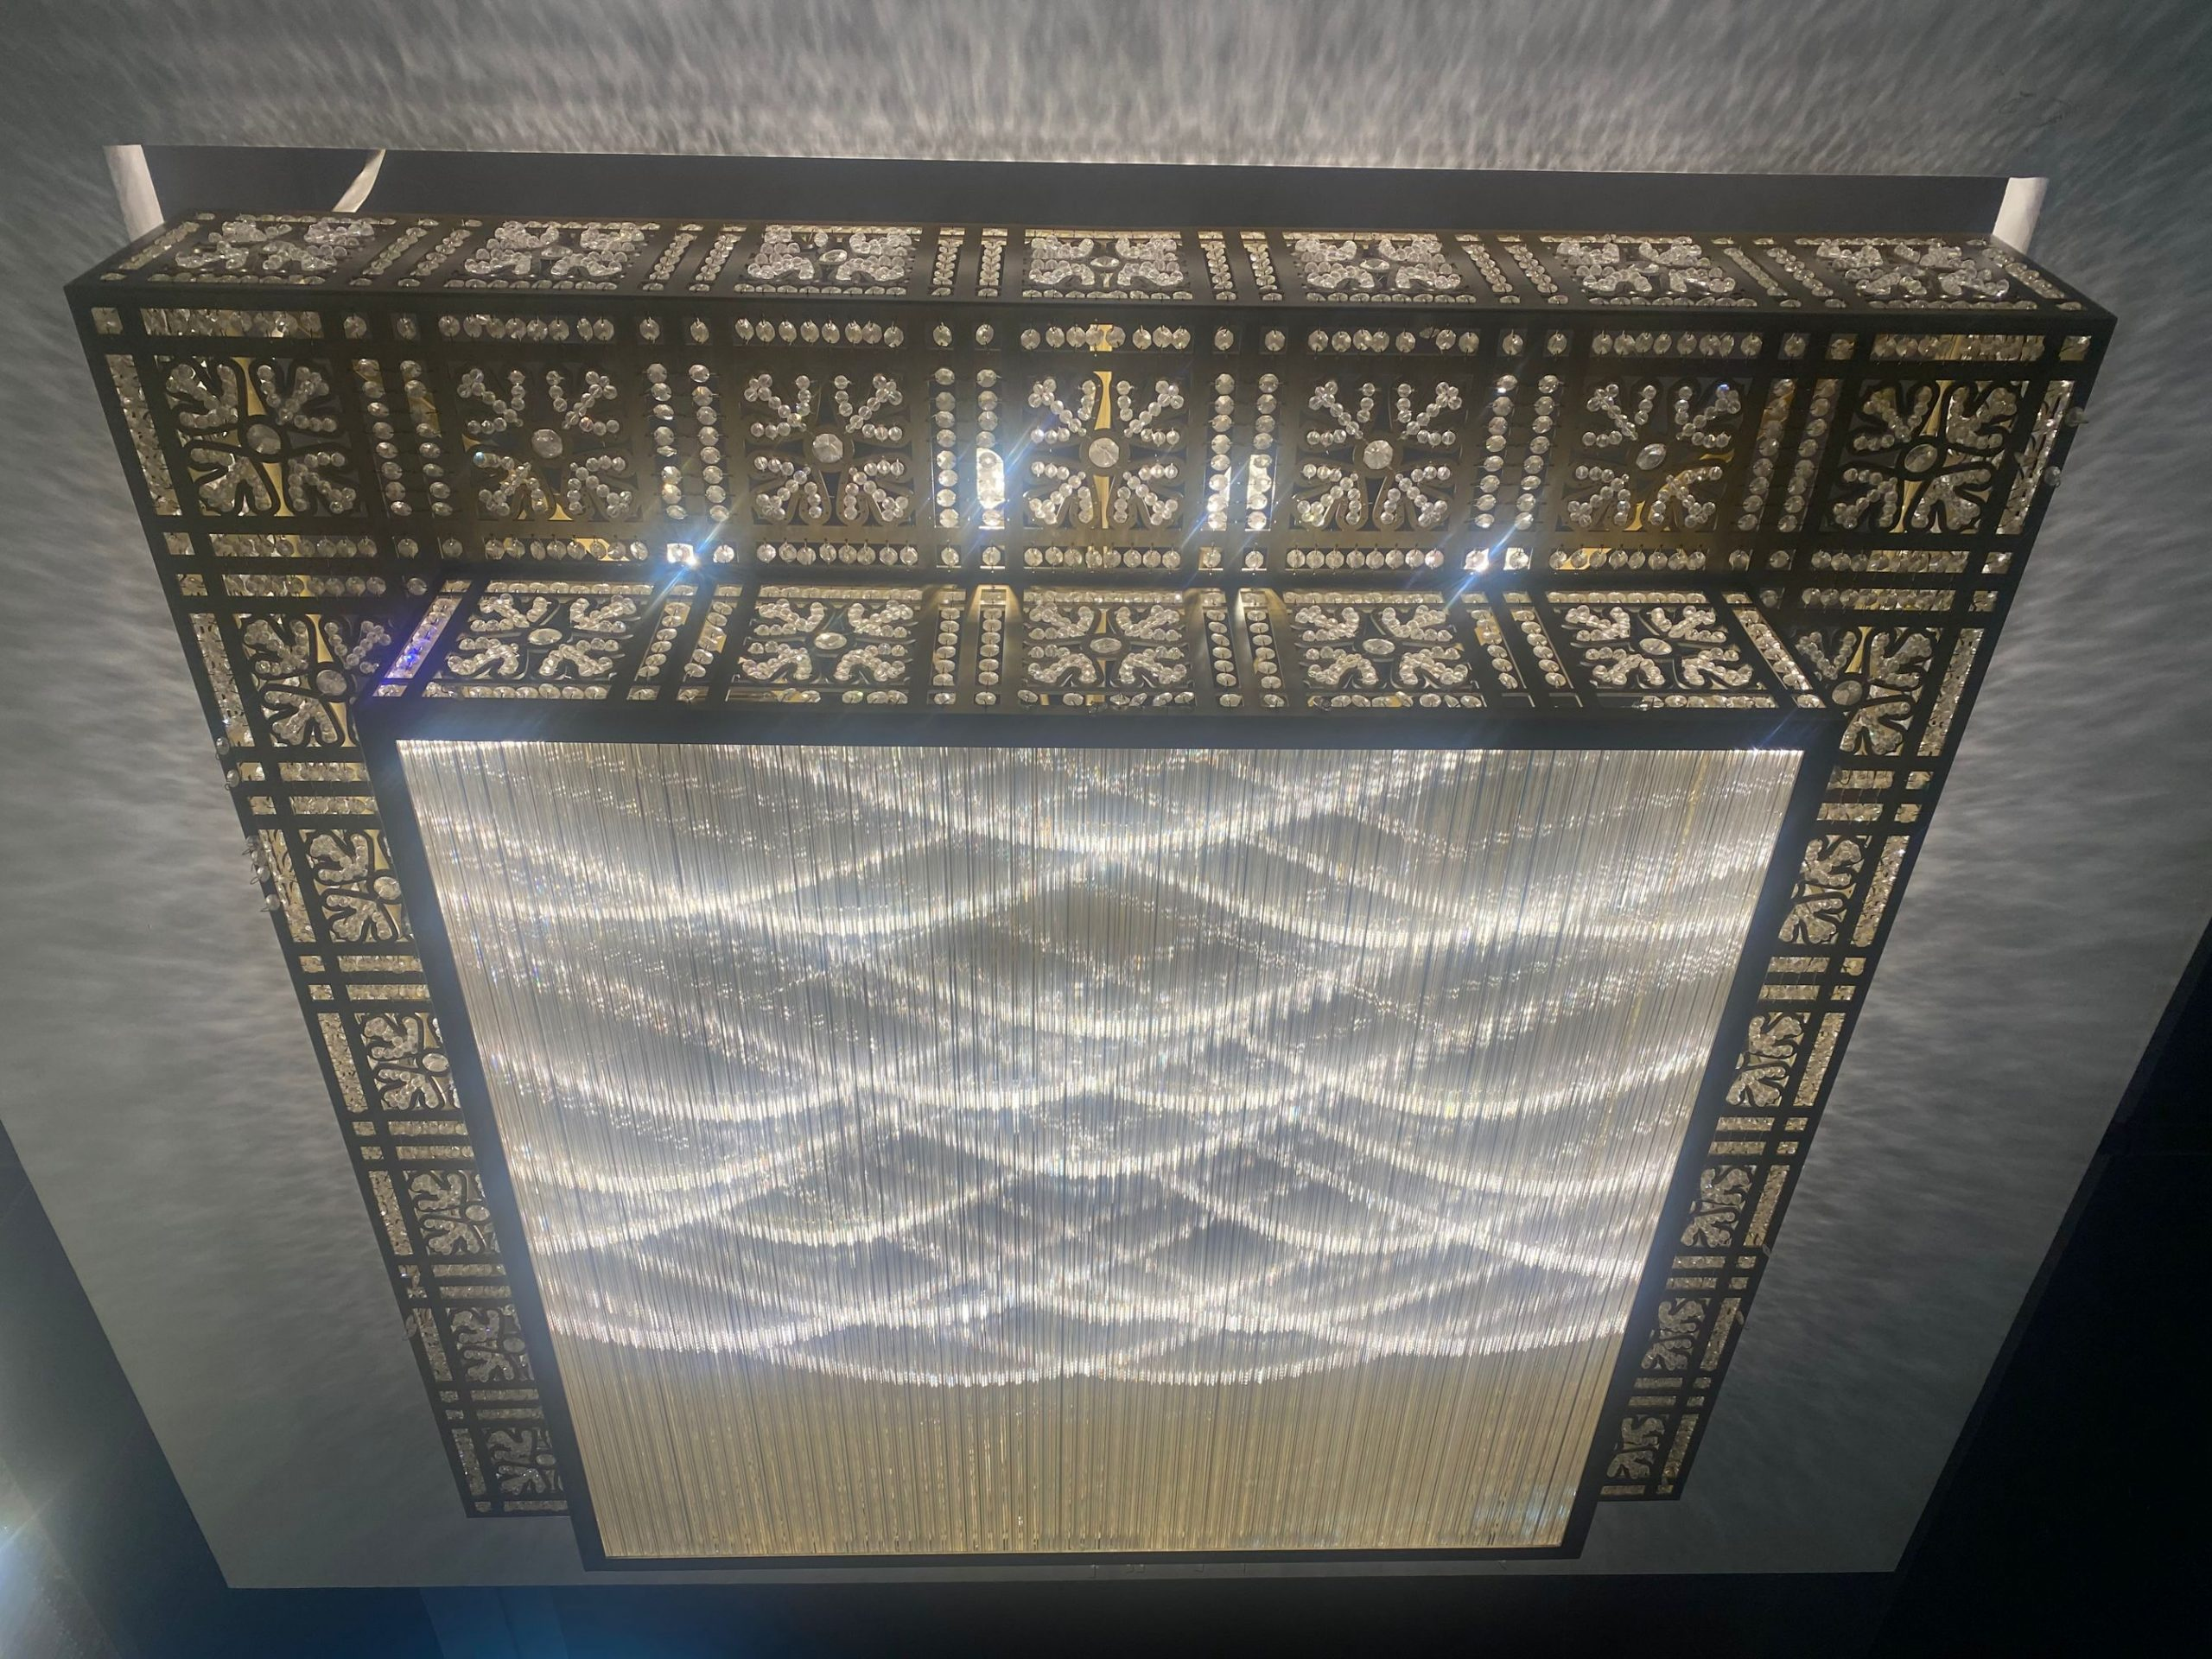 K&Y Ceiling Light